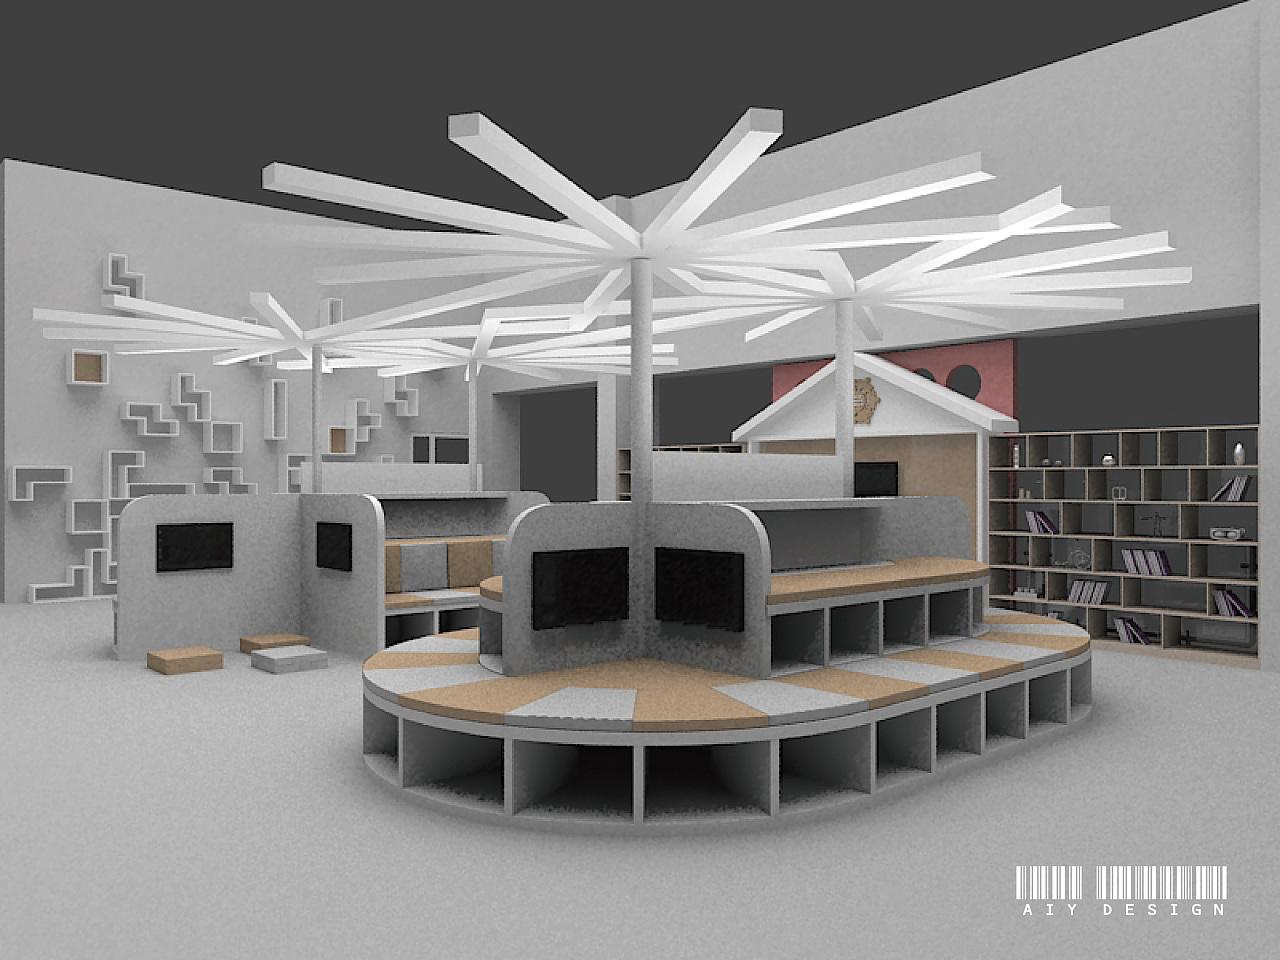 b类:校园文化 书吧 空间 展示设计  dmhulinbao图片